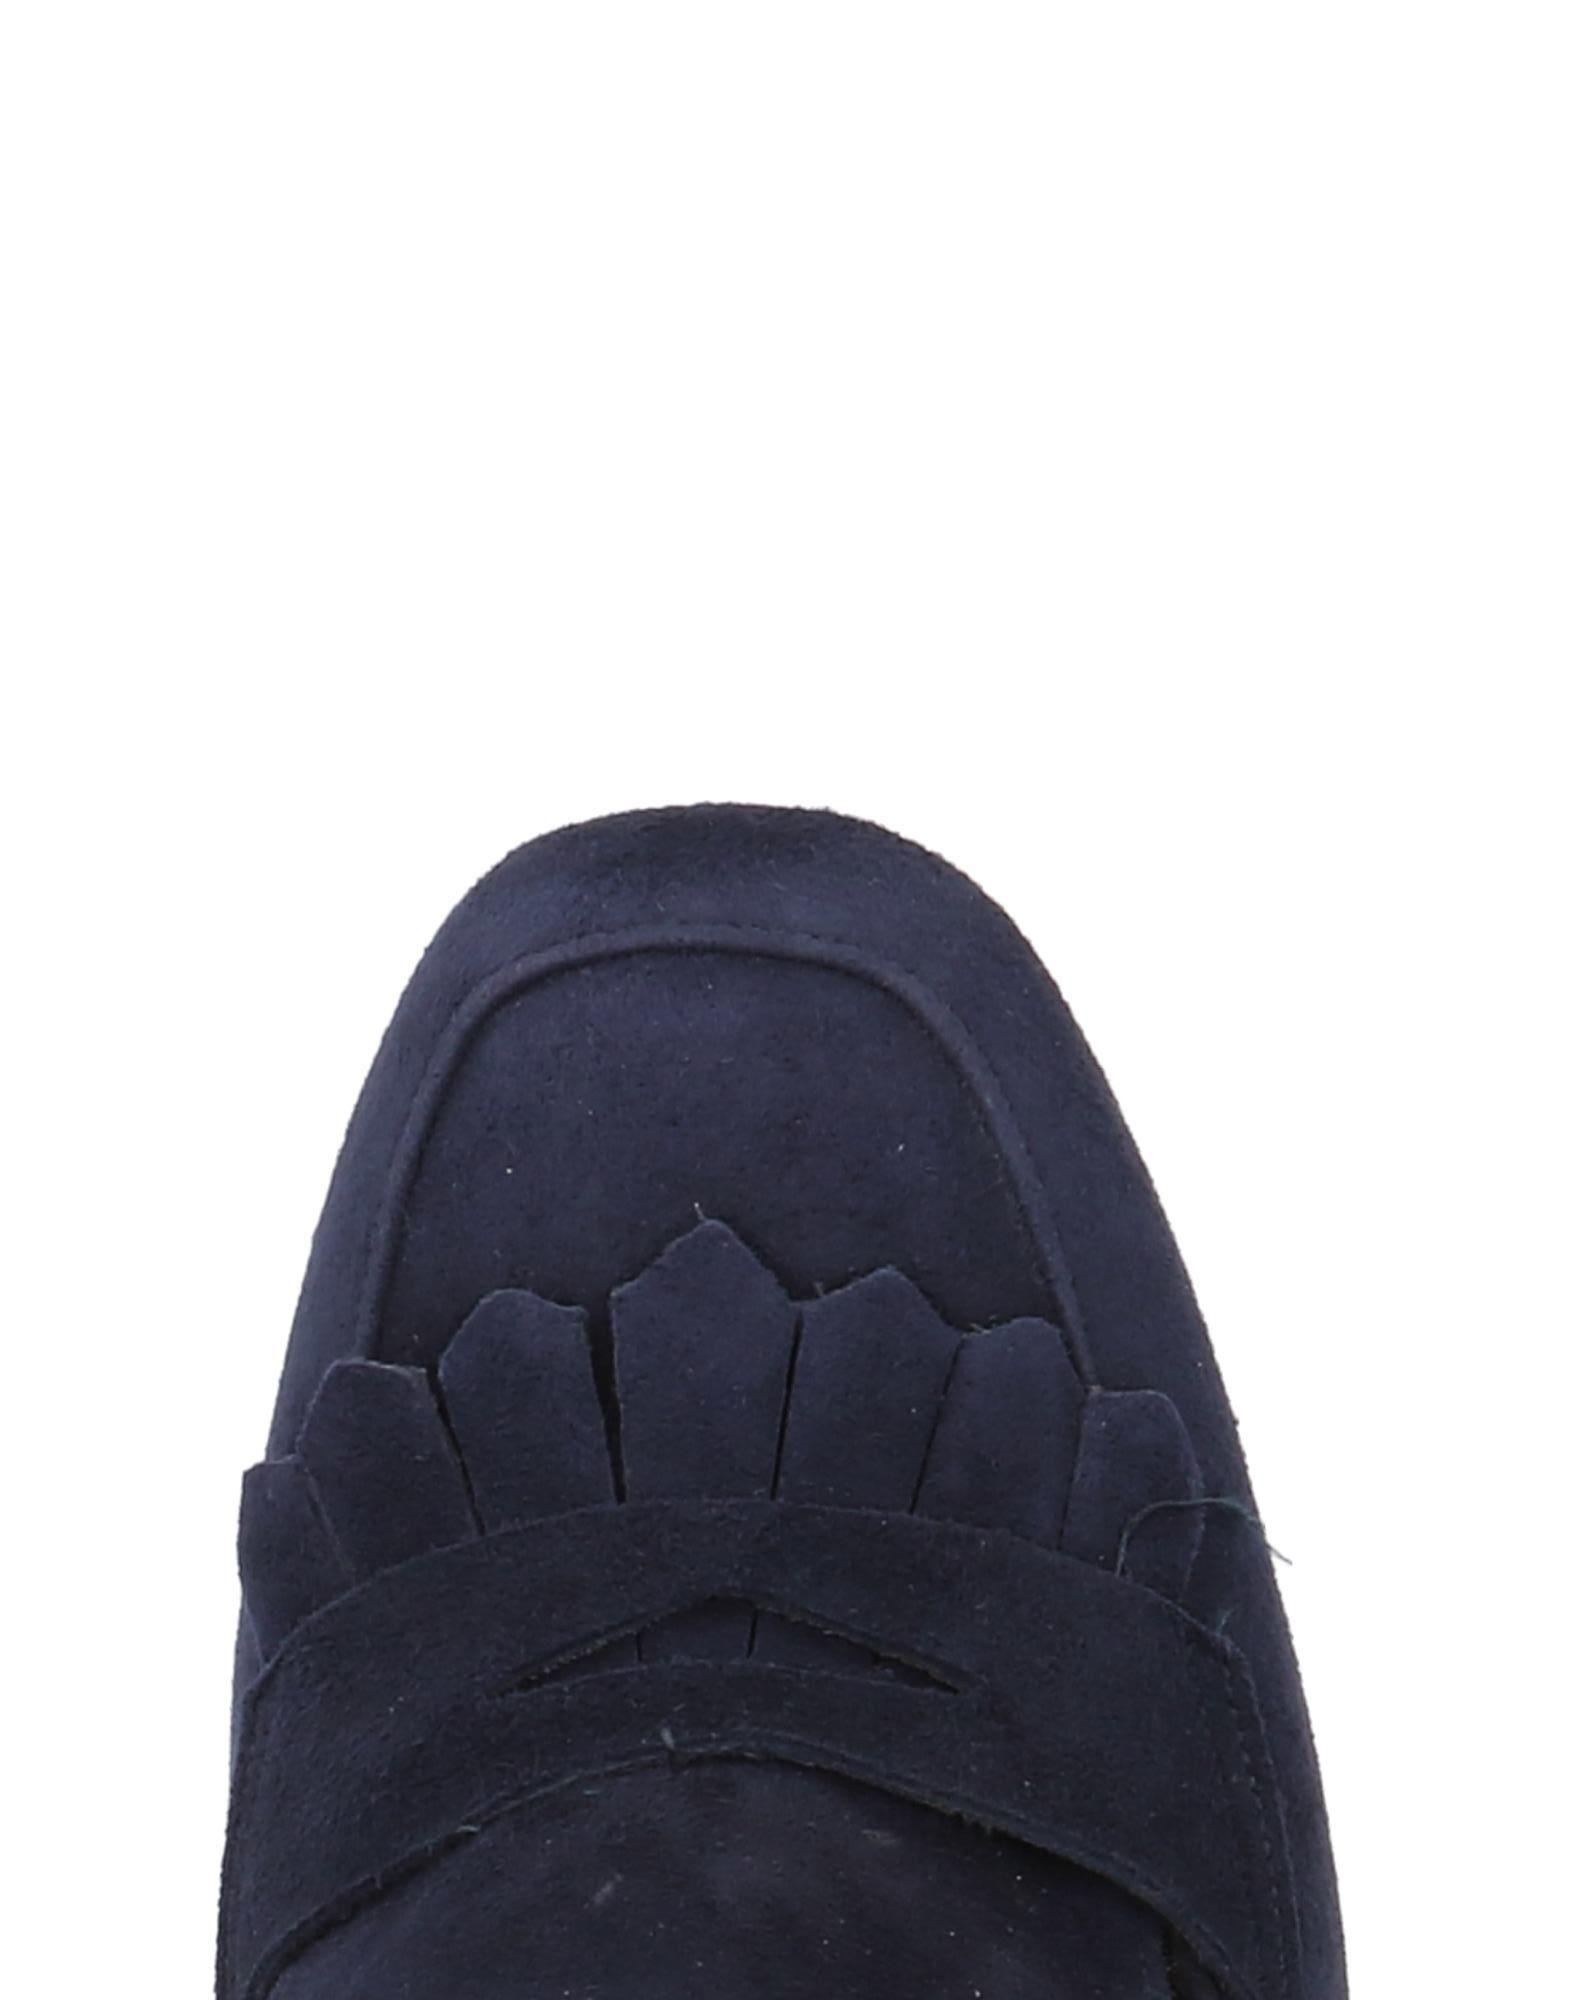 Manifattura National Mokassins Damen  Schuhe 11499145LI Neue Schuhe  f5e197